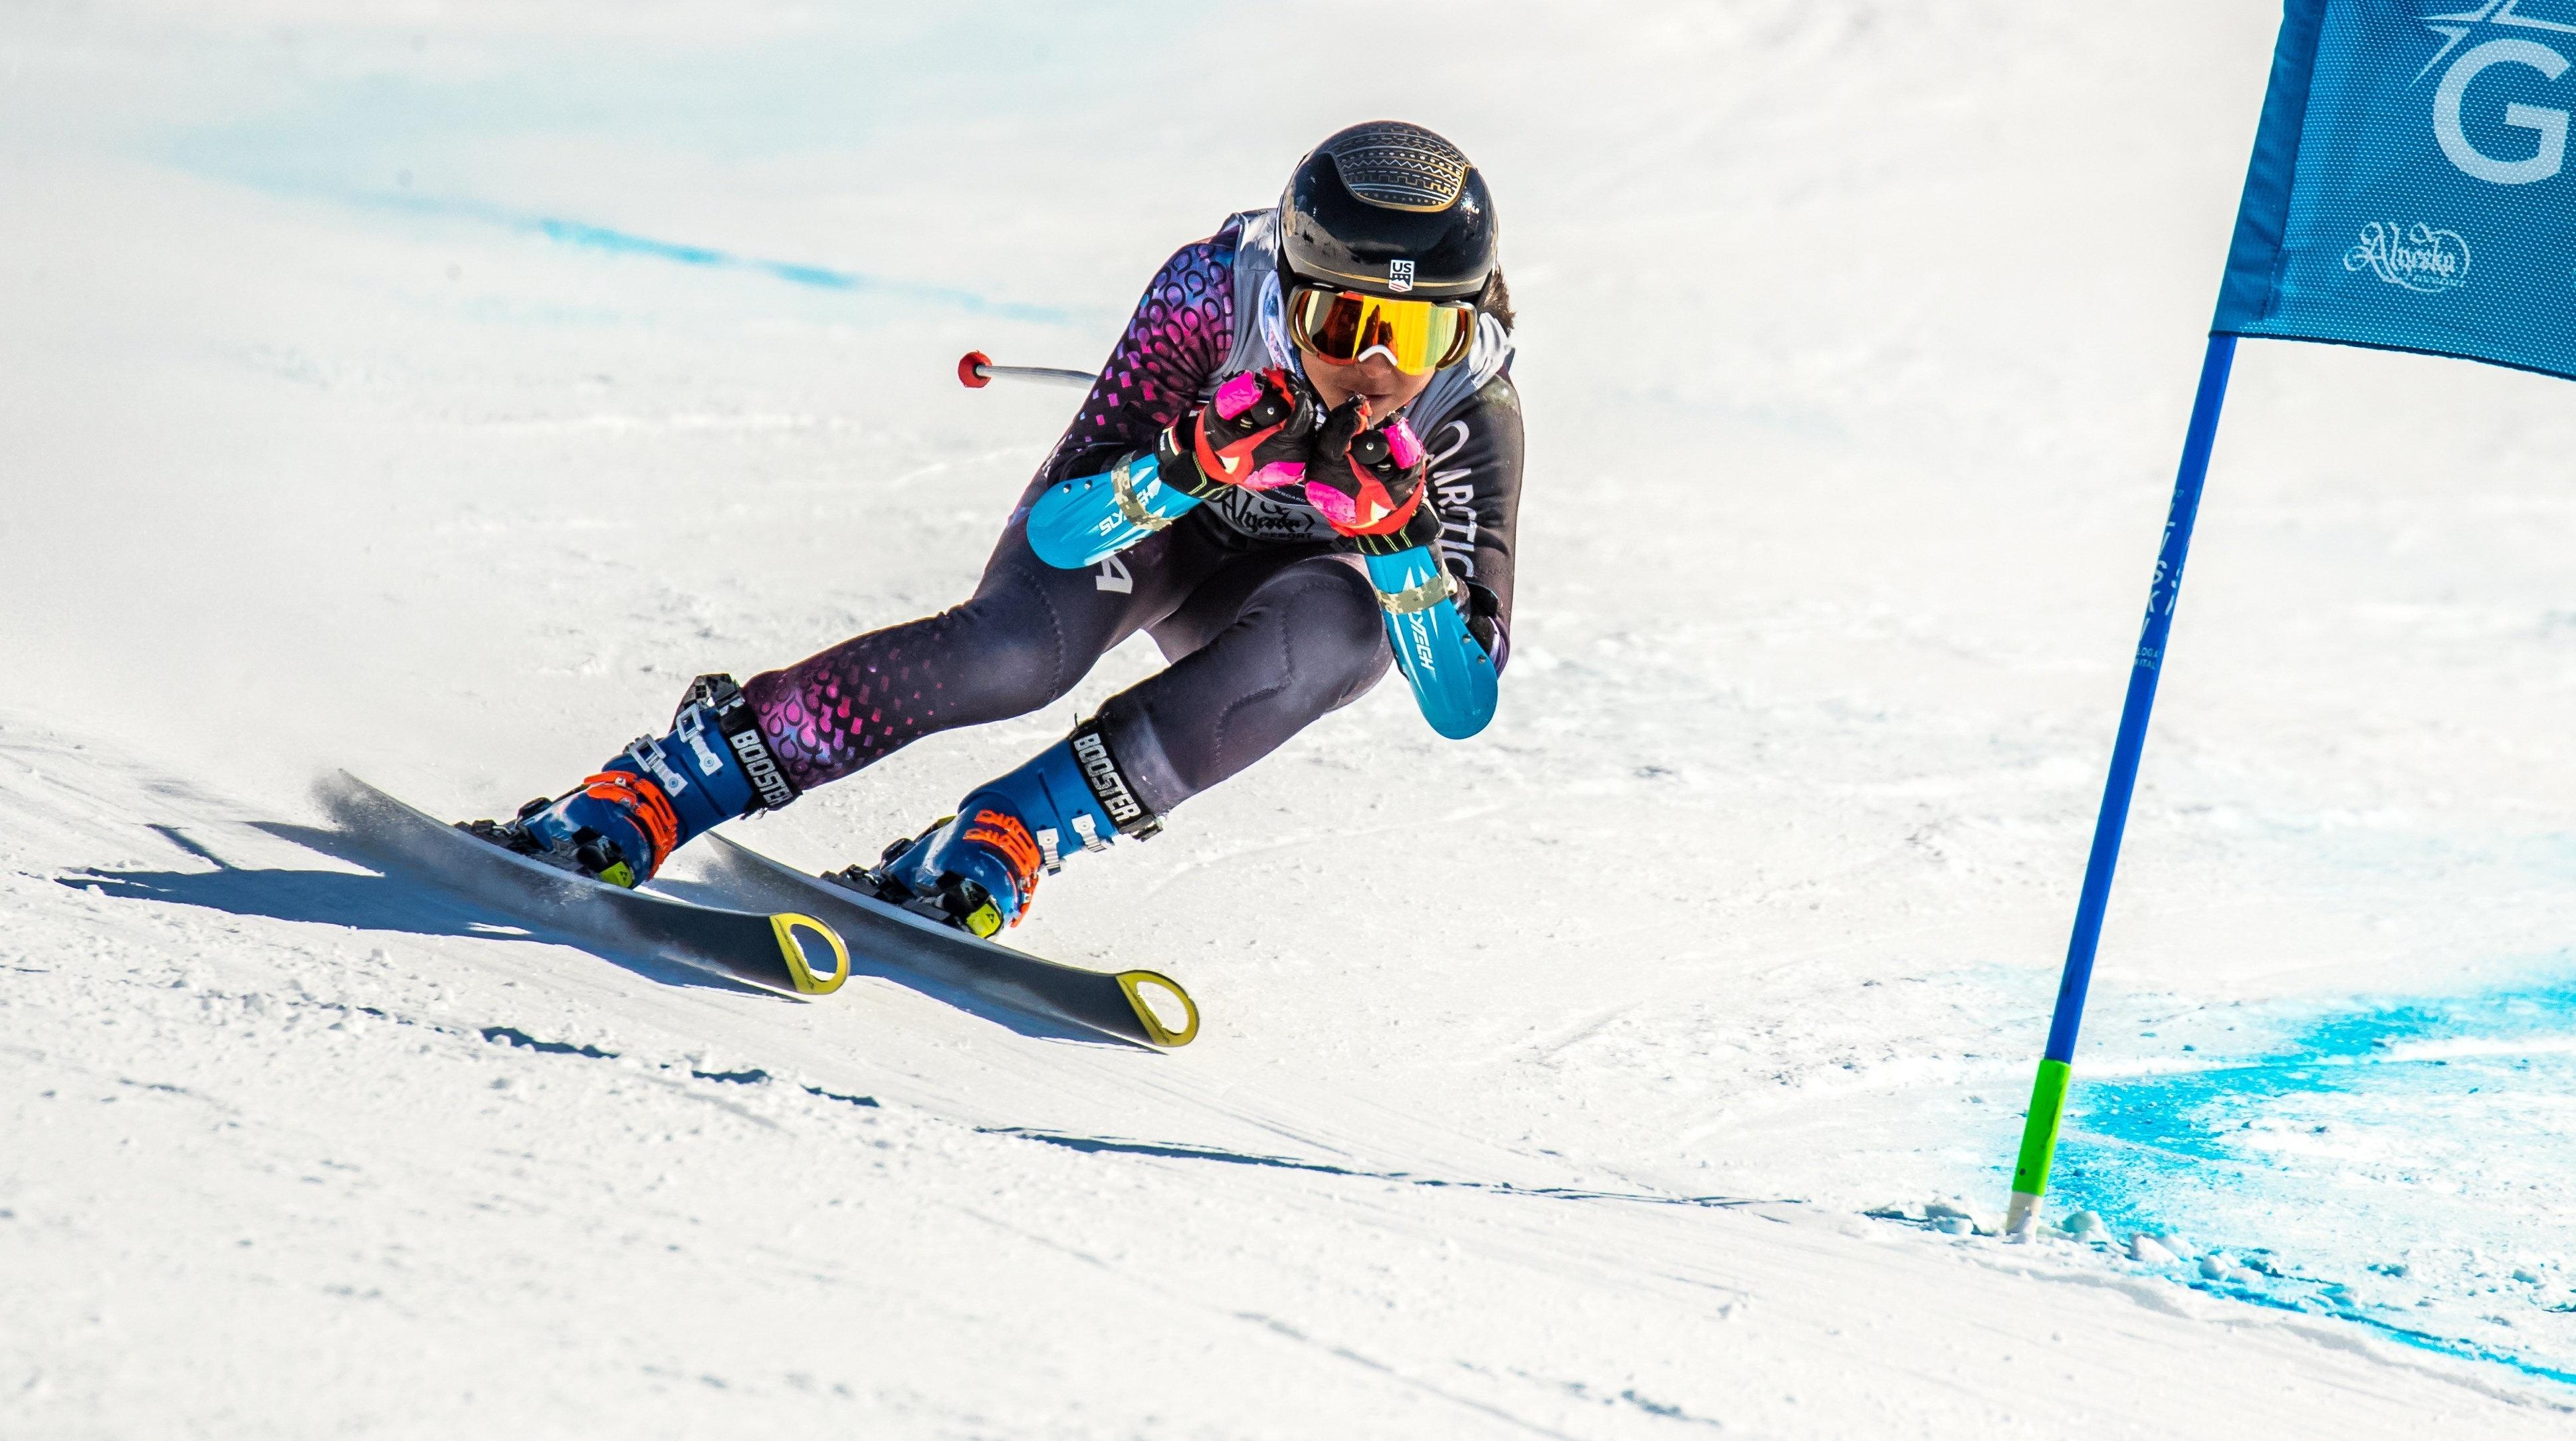 USSA member Jasmine Arrison competes at Western Region Championships in Alyeska, Alaska - Super G